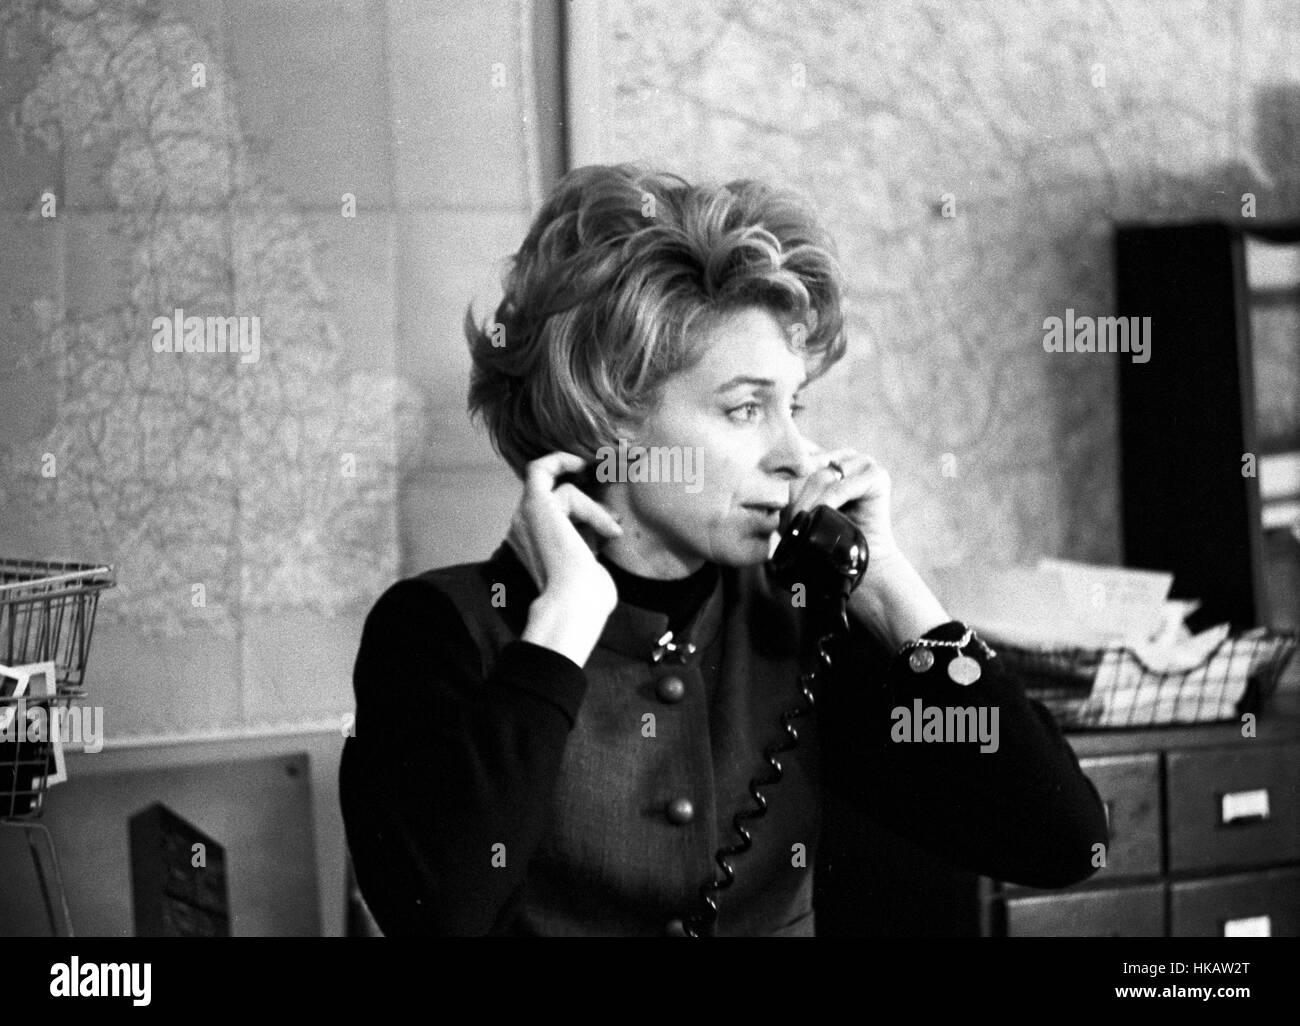 Caroline Benn (Caroline Middleton DeCamp), wife of Tony Benn, shown here working in Tony's office in 1963. - Stock Image